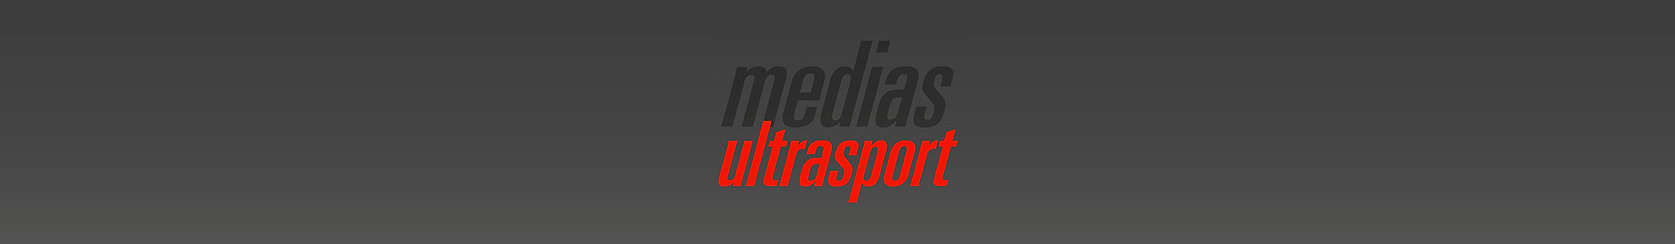 portada medias ULTRASPORT2b.jpg